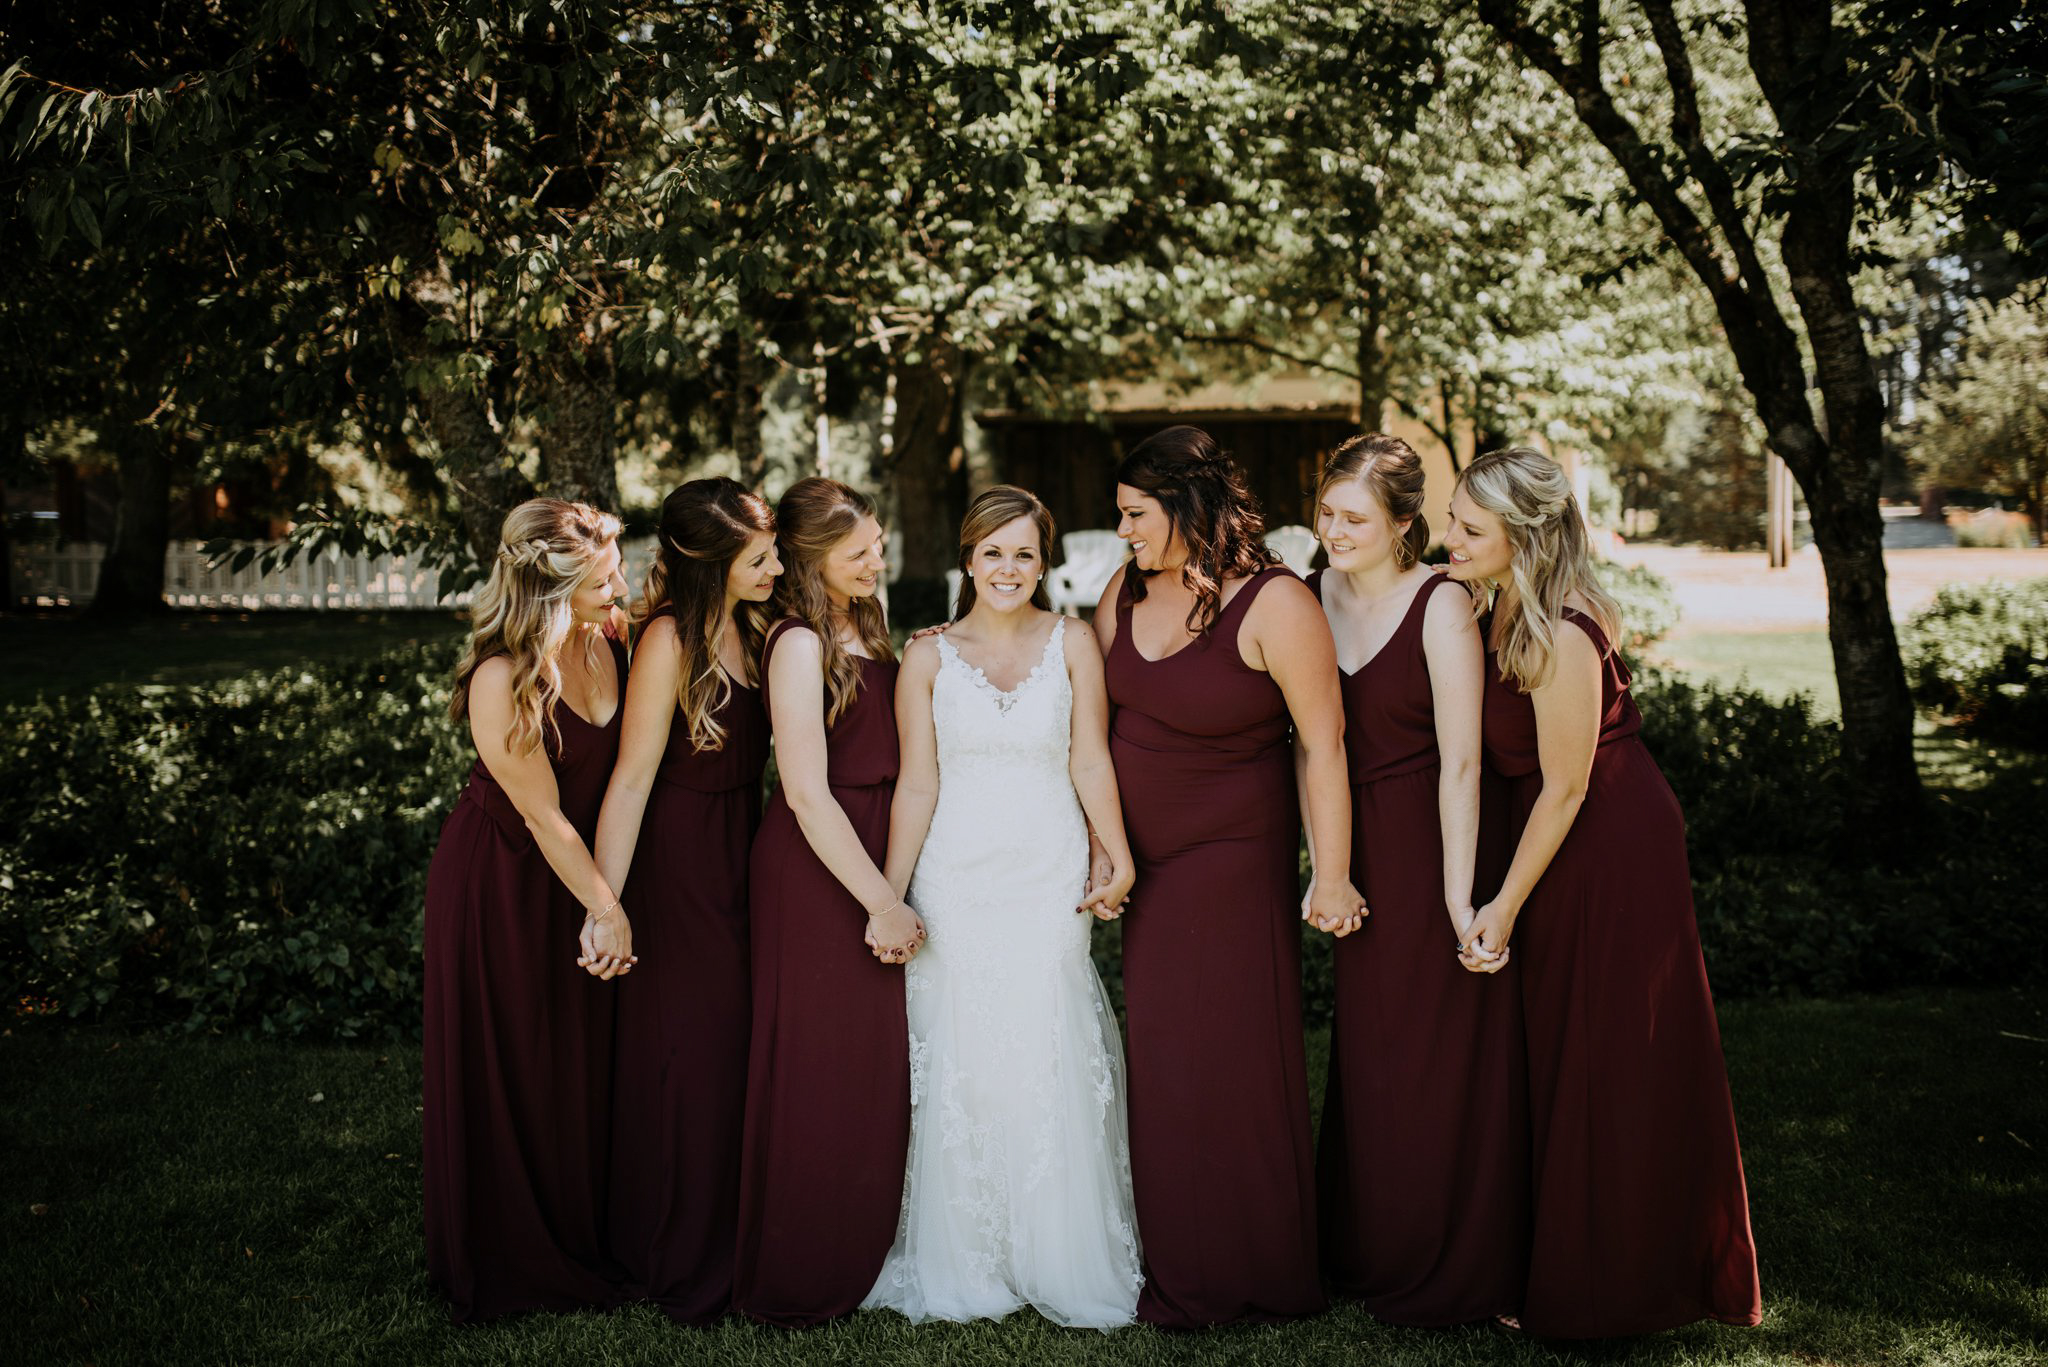 kristen-and-cody-the-kelley-farm-wedding-seattle-photographer-caitlyn-nikula-38.jpg